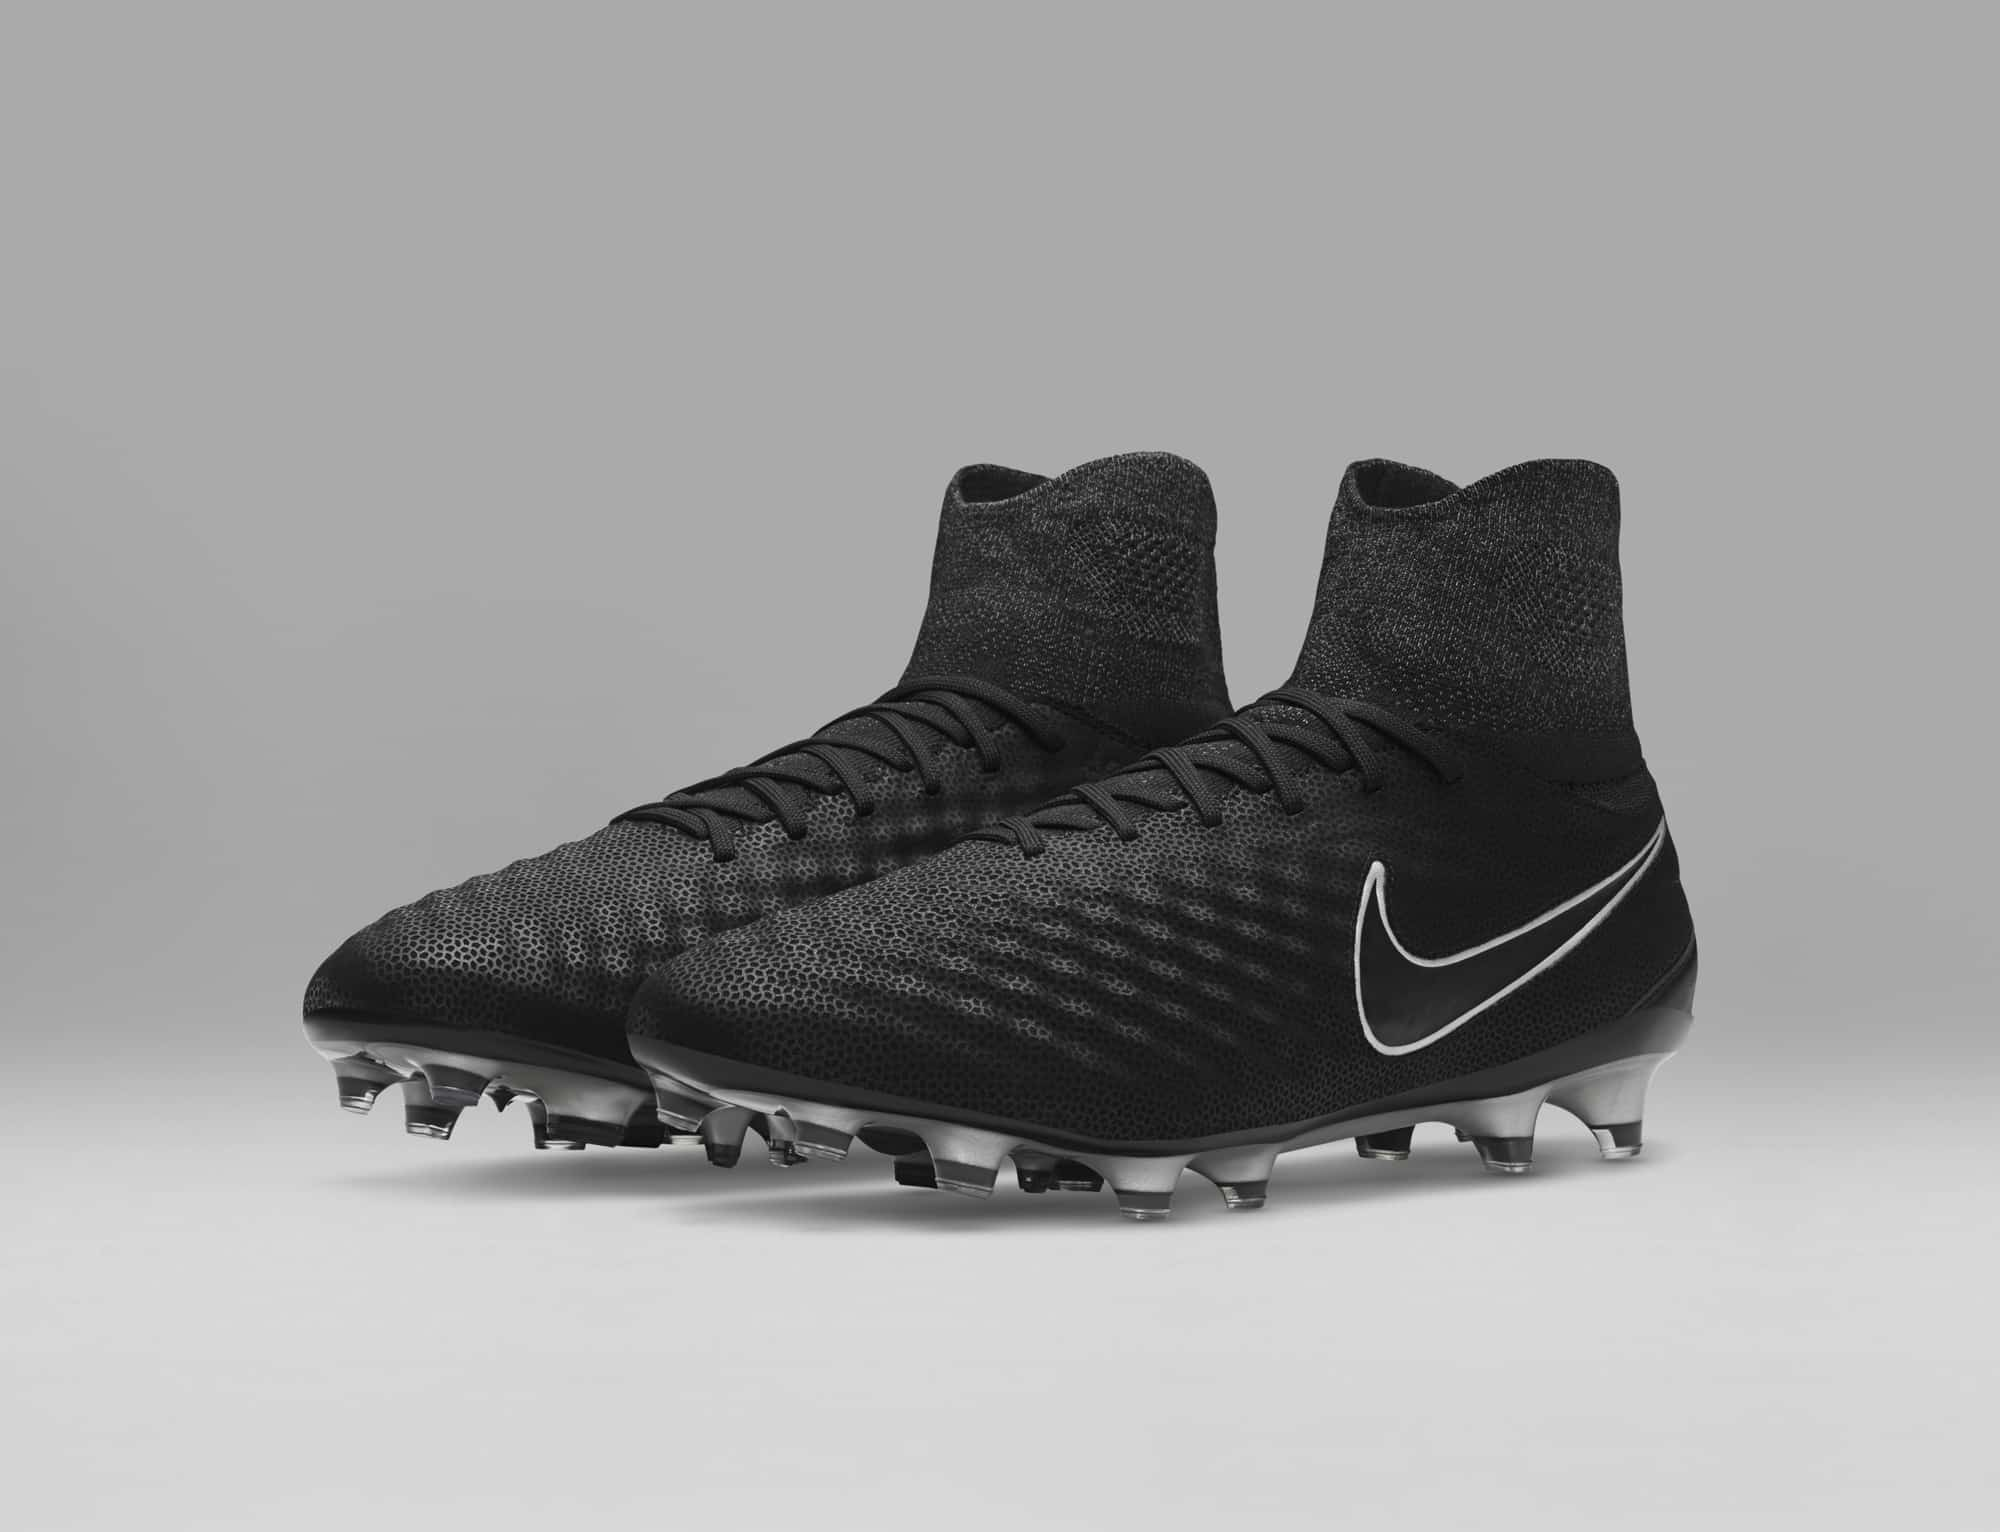 chaussures-football-nike-magista-obra-2-tech-craft-img1